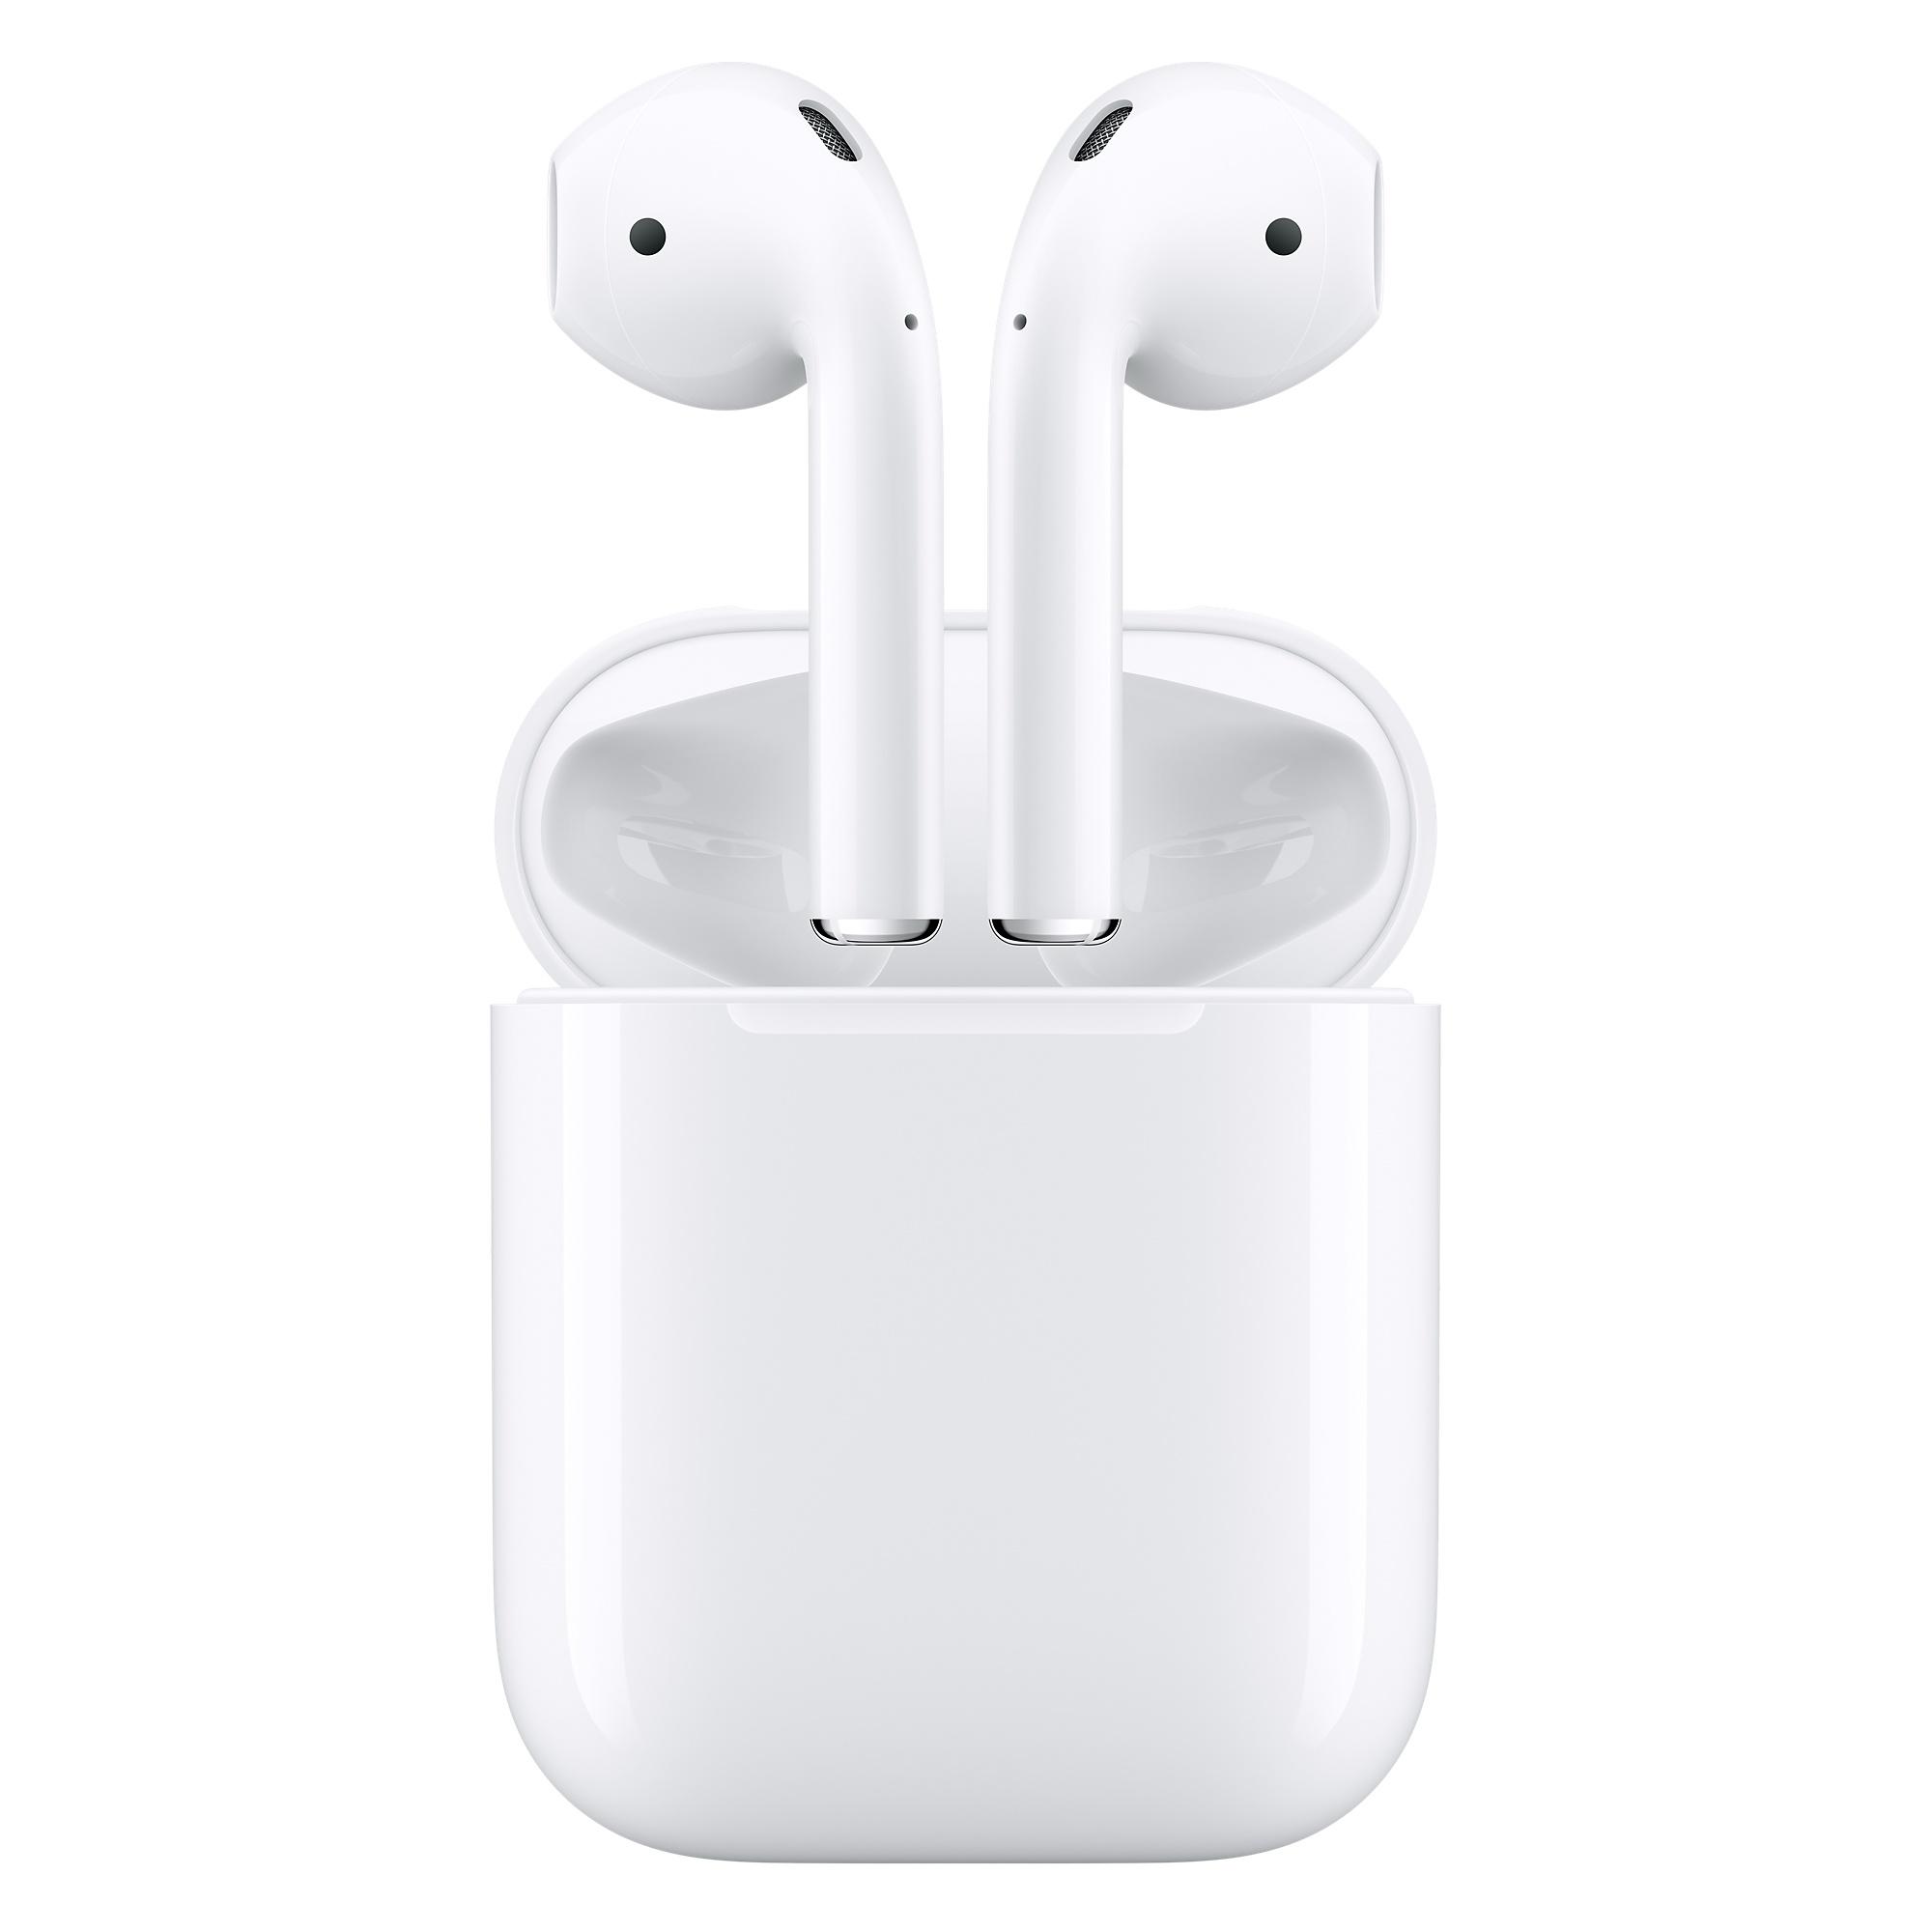 Auriculares Apple Airpods Gen 2